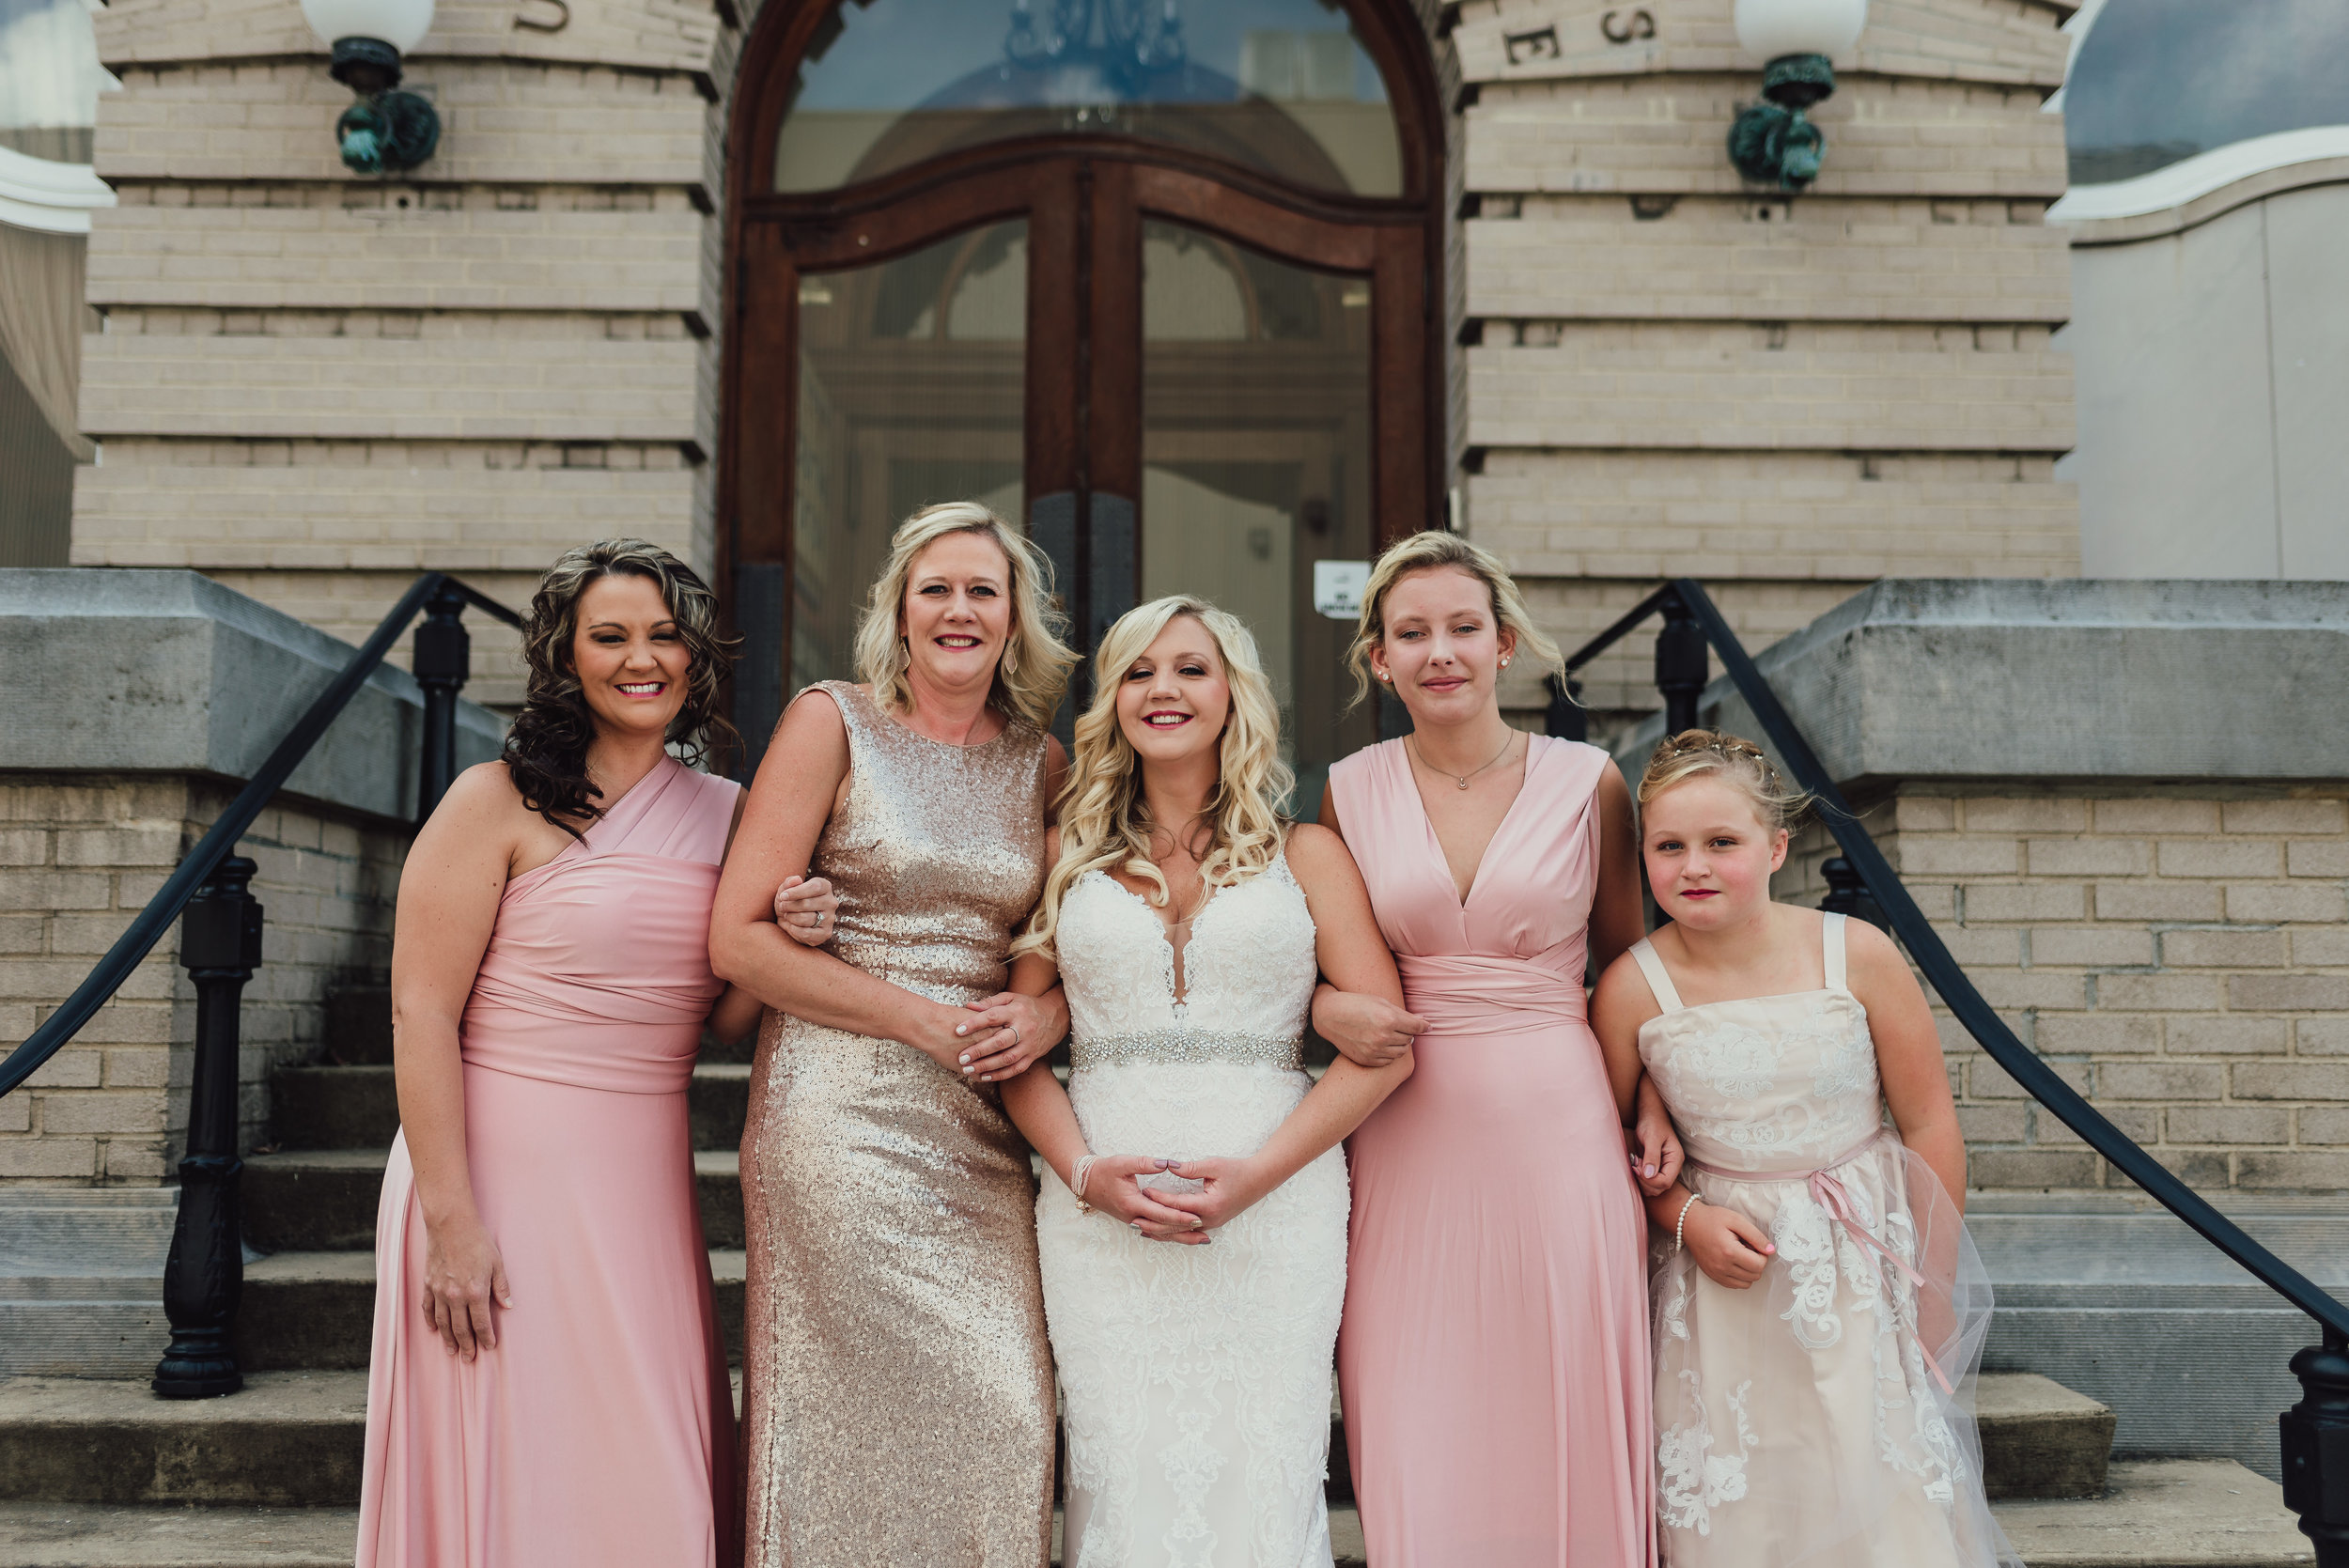 east-tn-wedding-photographer-tennessee-elopement-photographer-kingsport-tn-wedding-photographer (294 of 1001).jpg